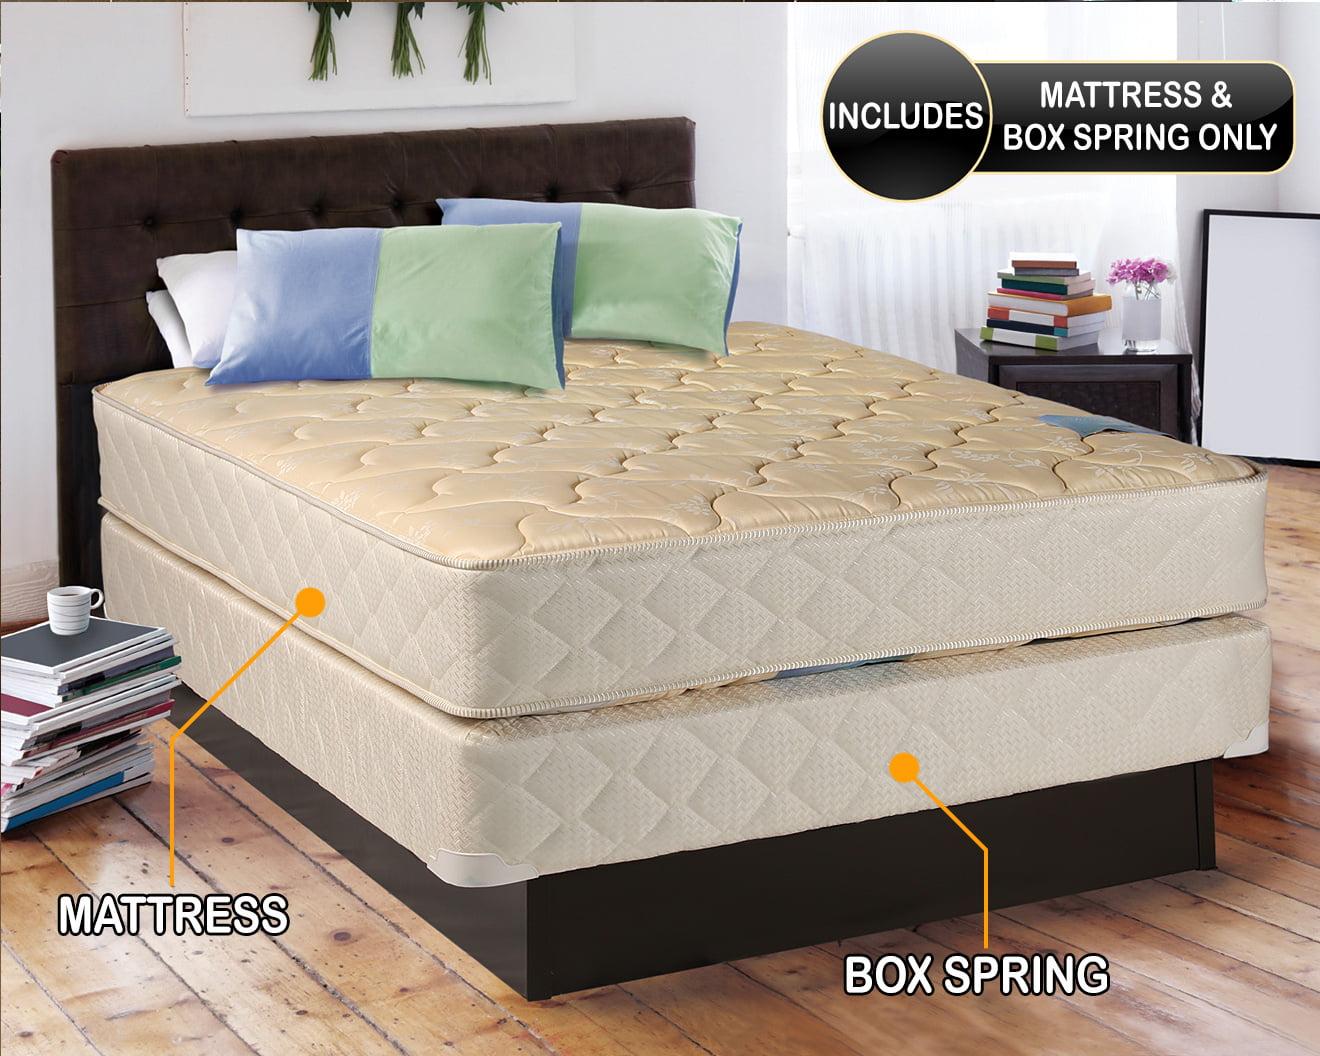 mattress considering combo and size twin jeffsbakery of best boxspring set image